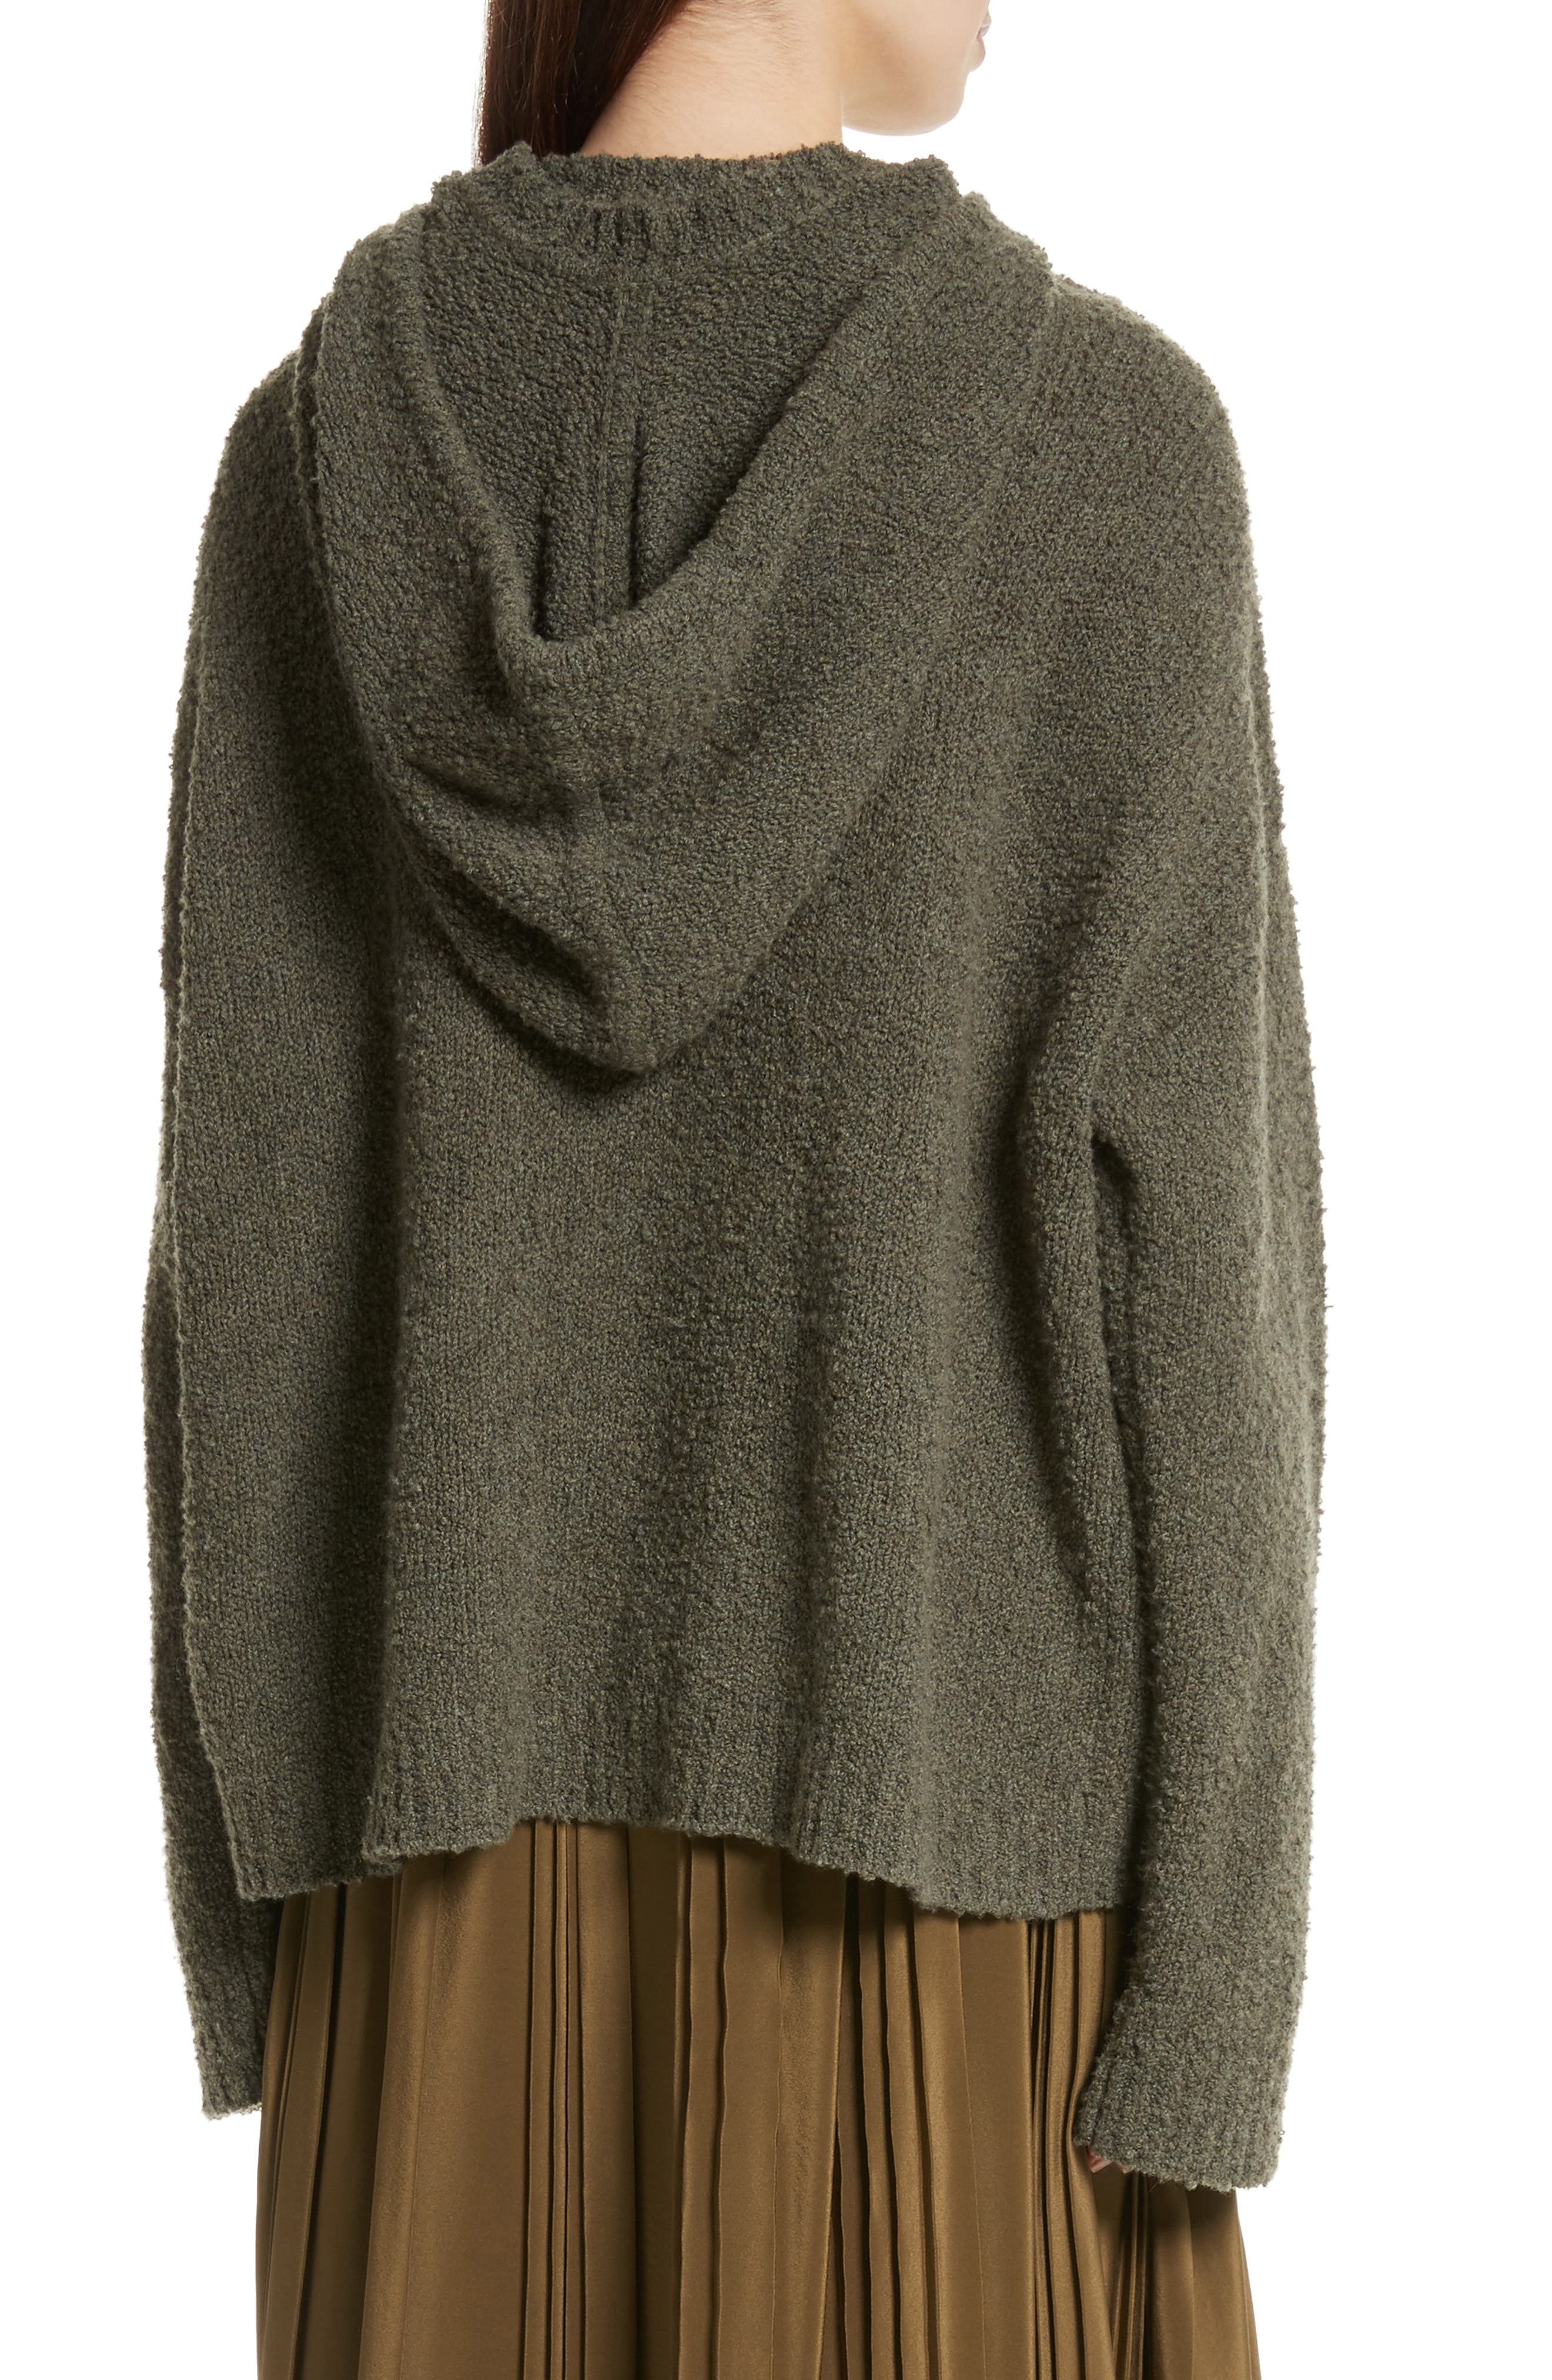 Alternate Image 3  - Robert Rodriguez Merino Wool & Cashmere Reversible Hooded Sweater